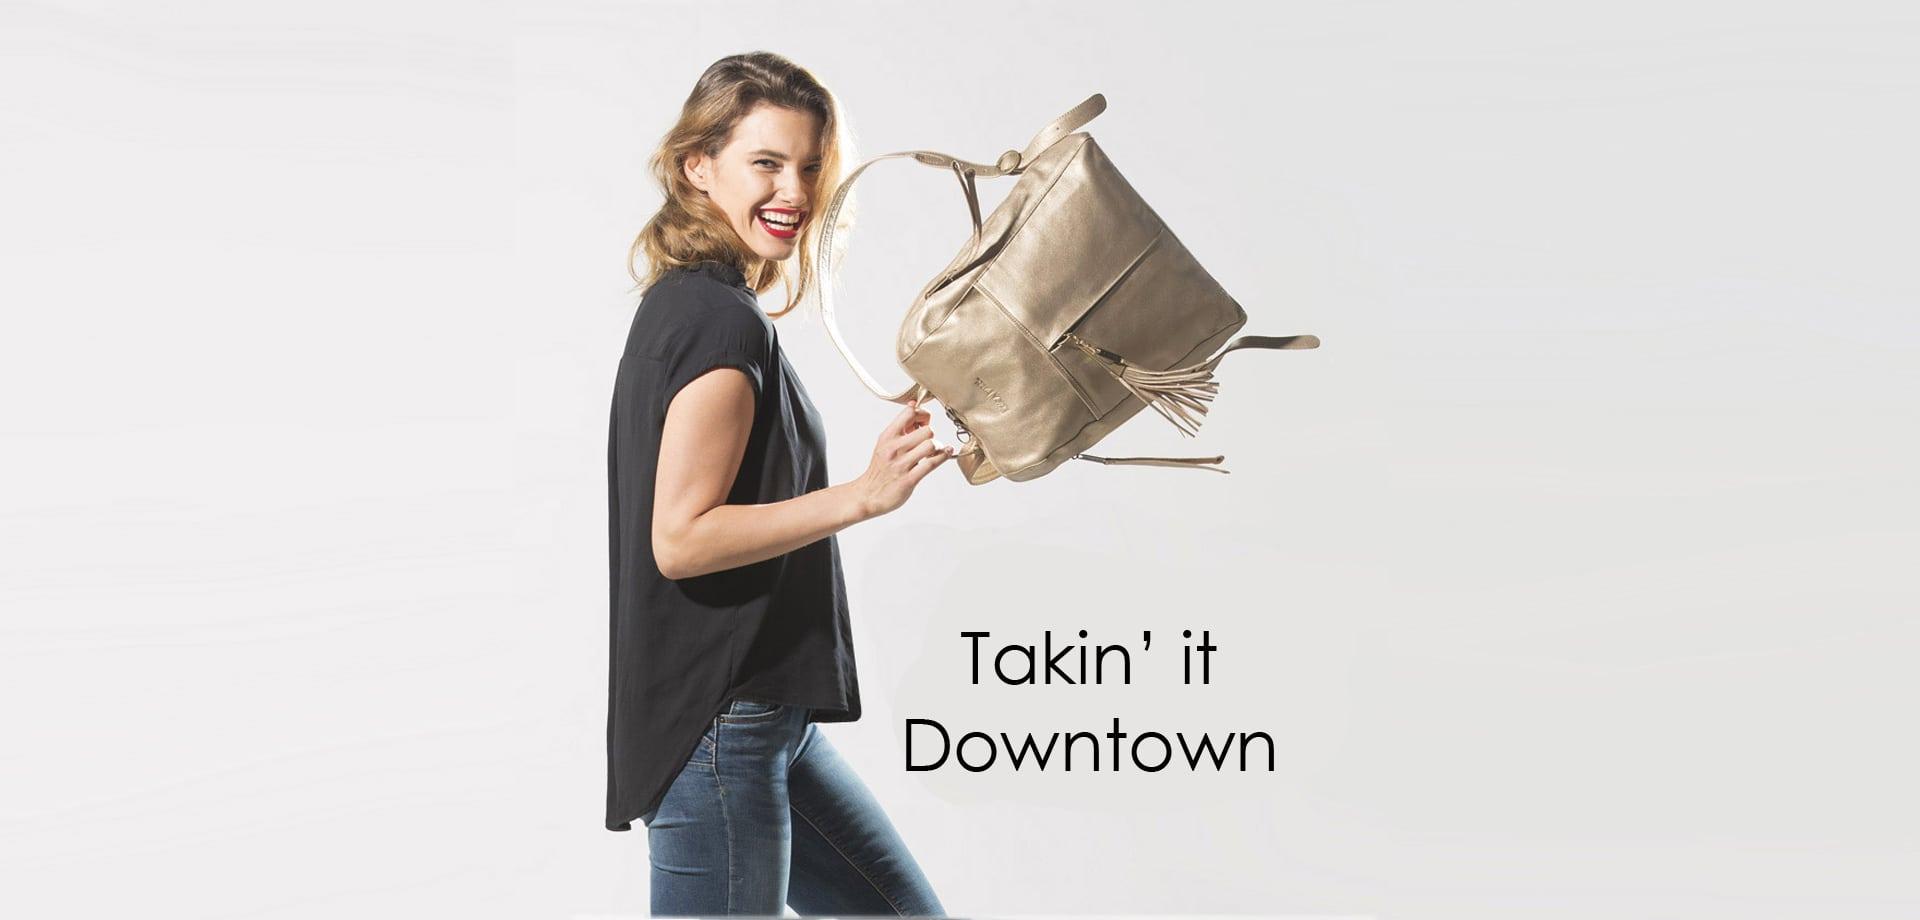 Downtown slider